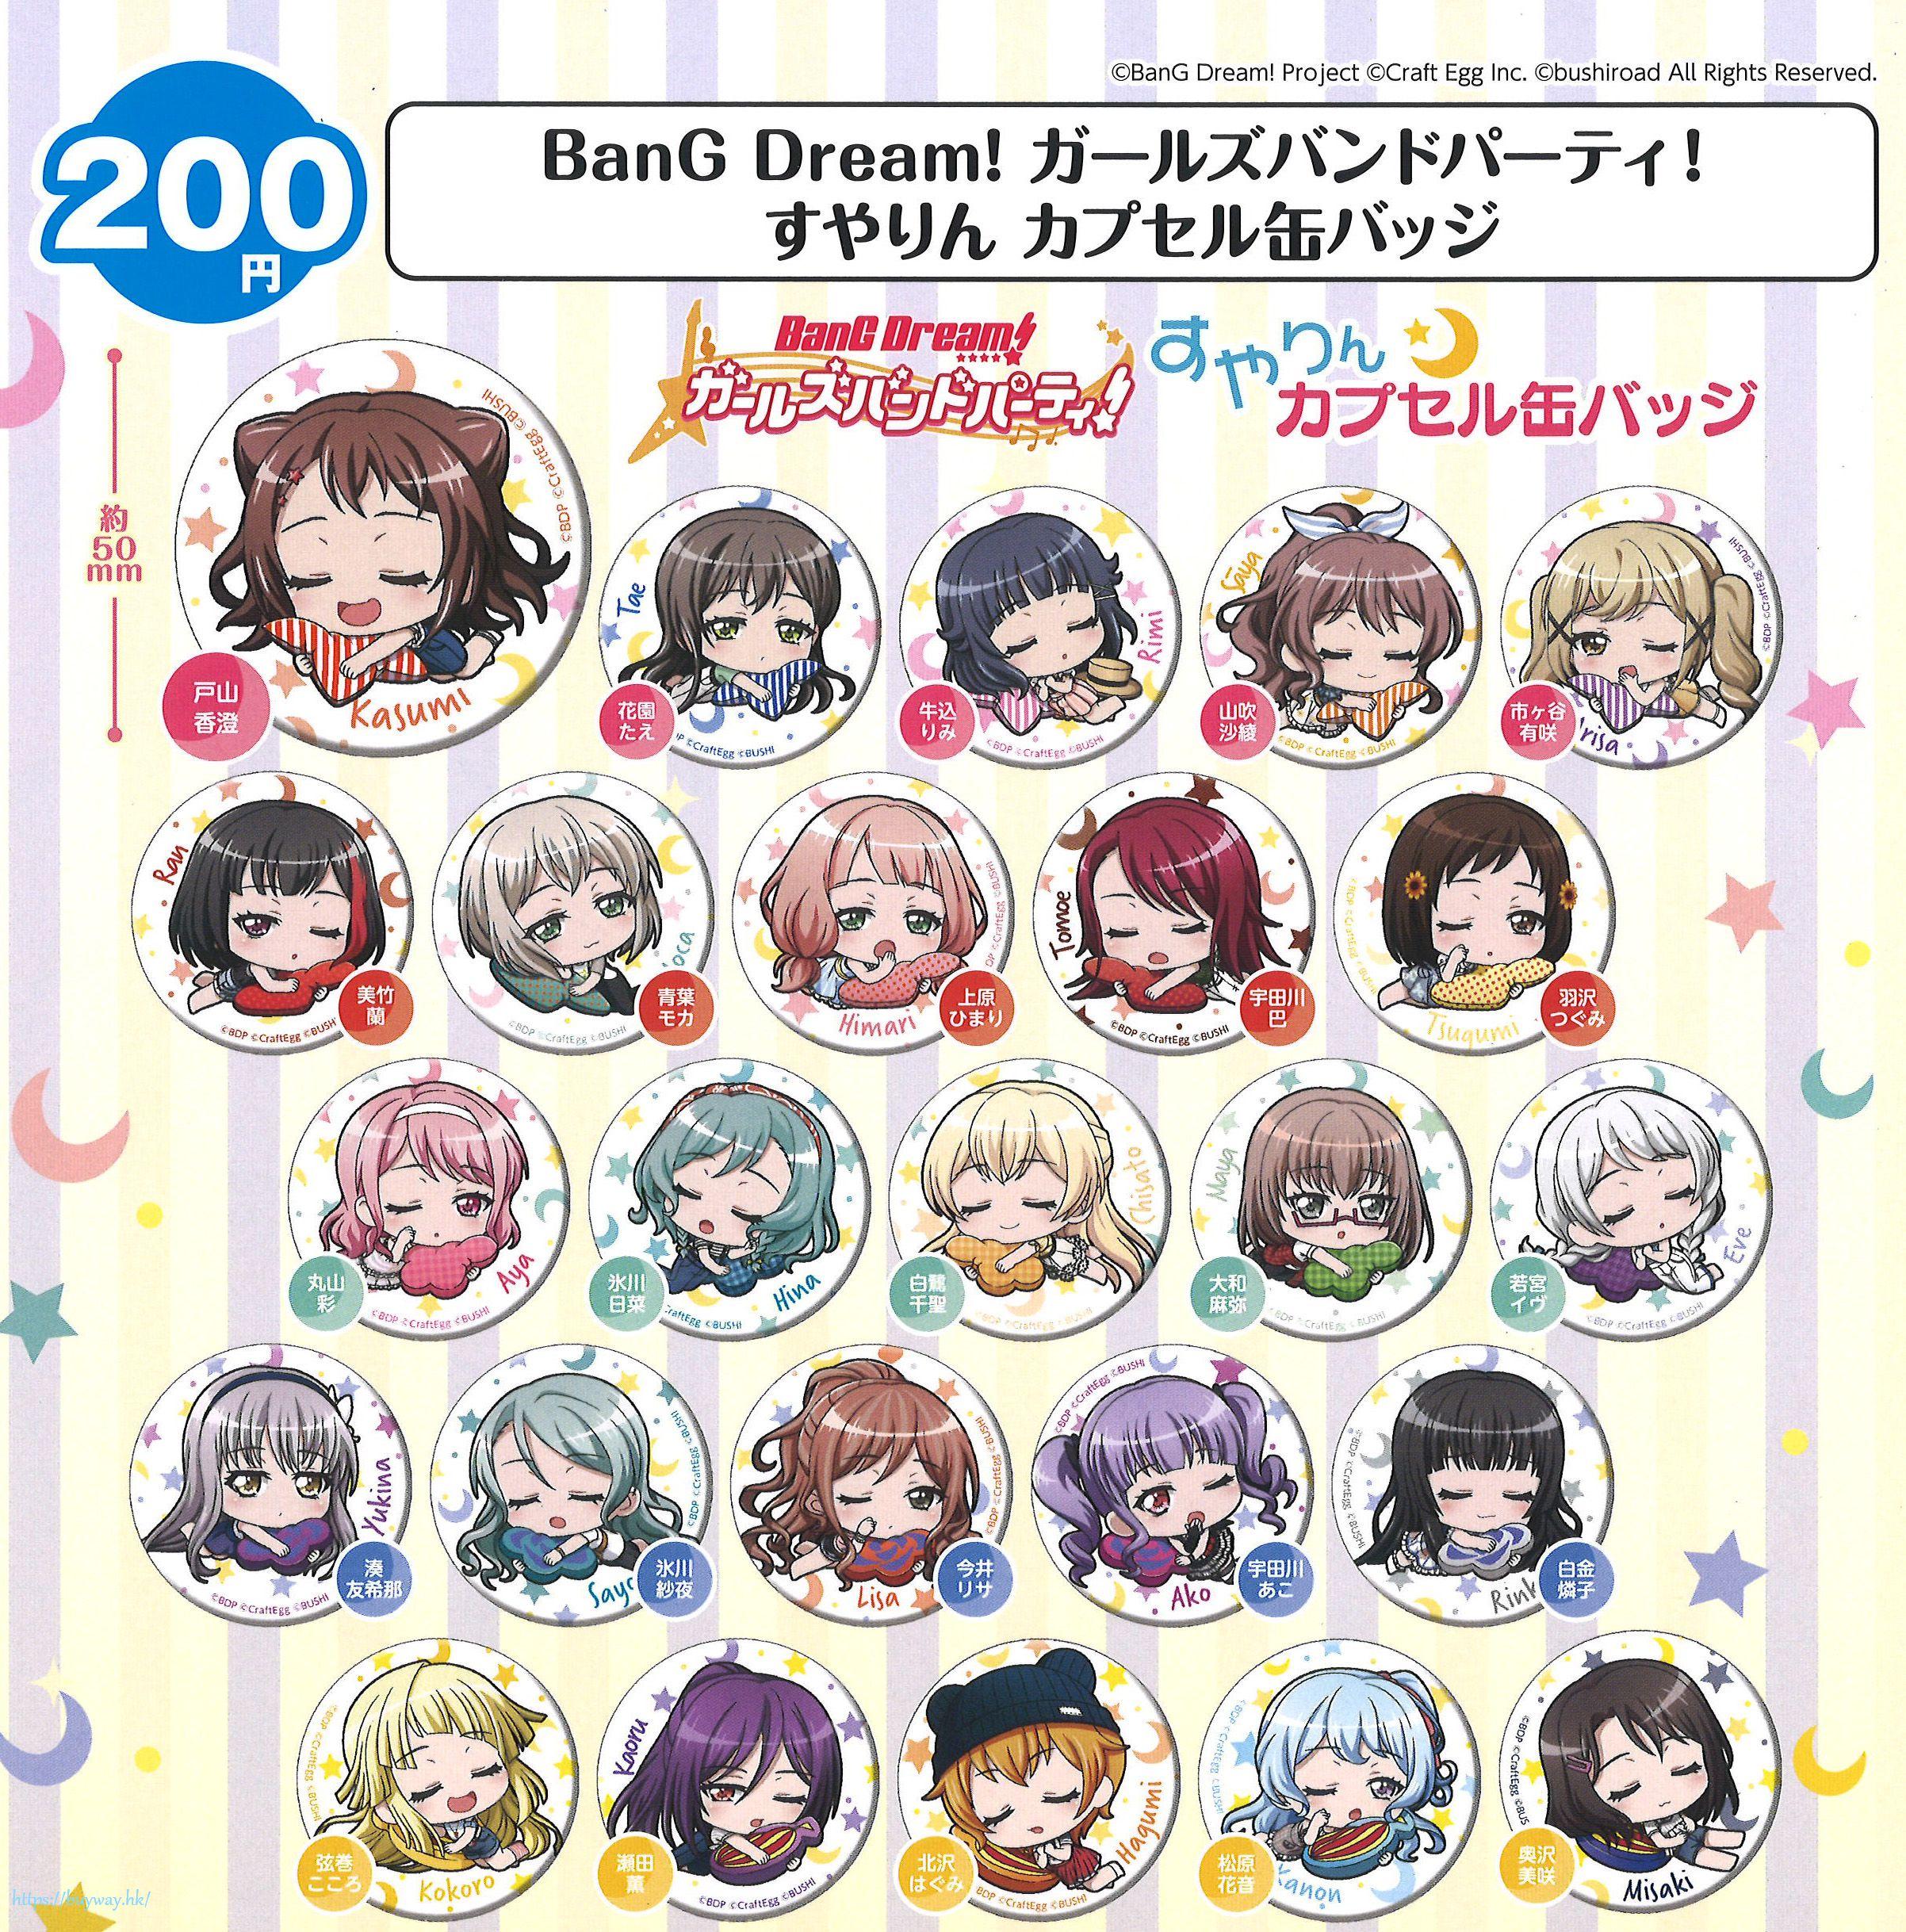 BanG Dream! 晚安了~! 收藏徽章扭蛋 (50 個入) Suyarin Capsule Can Badge (50 Pieces)【BanG Dream!】